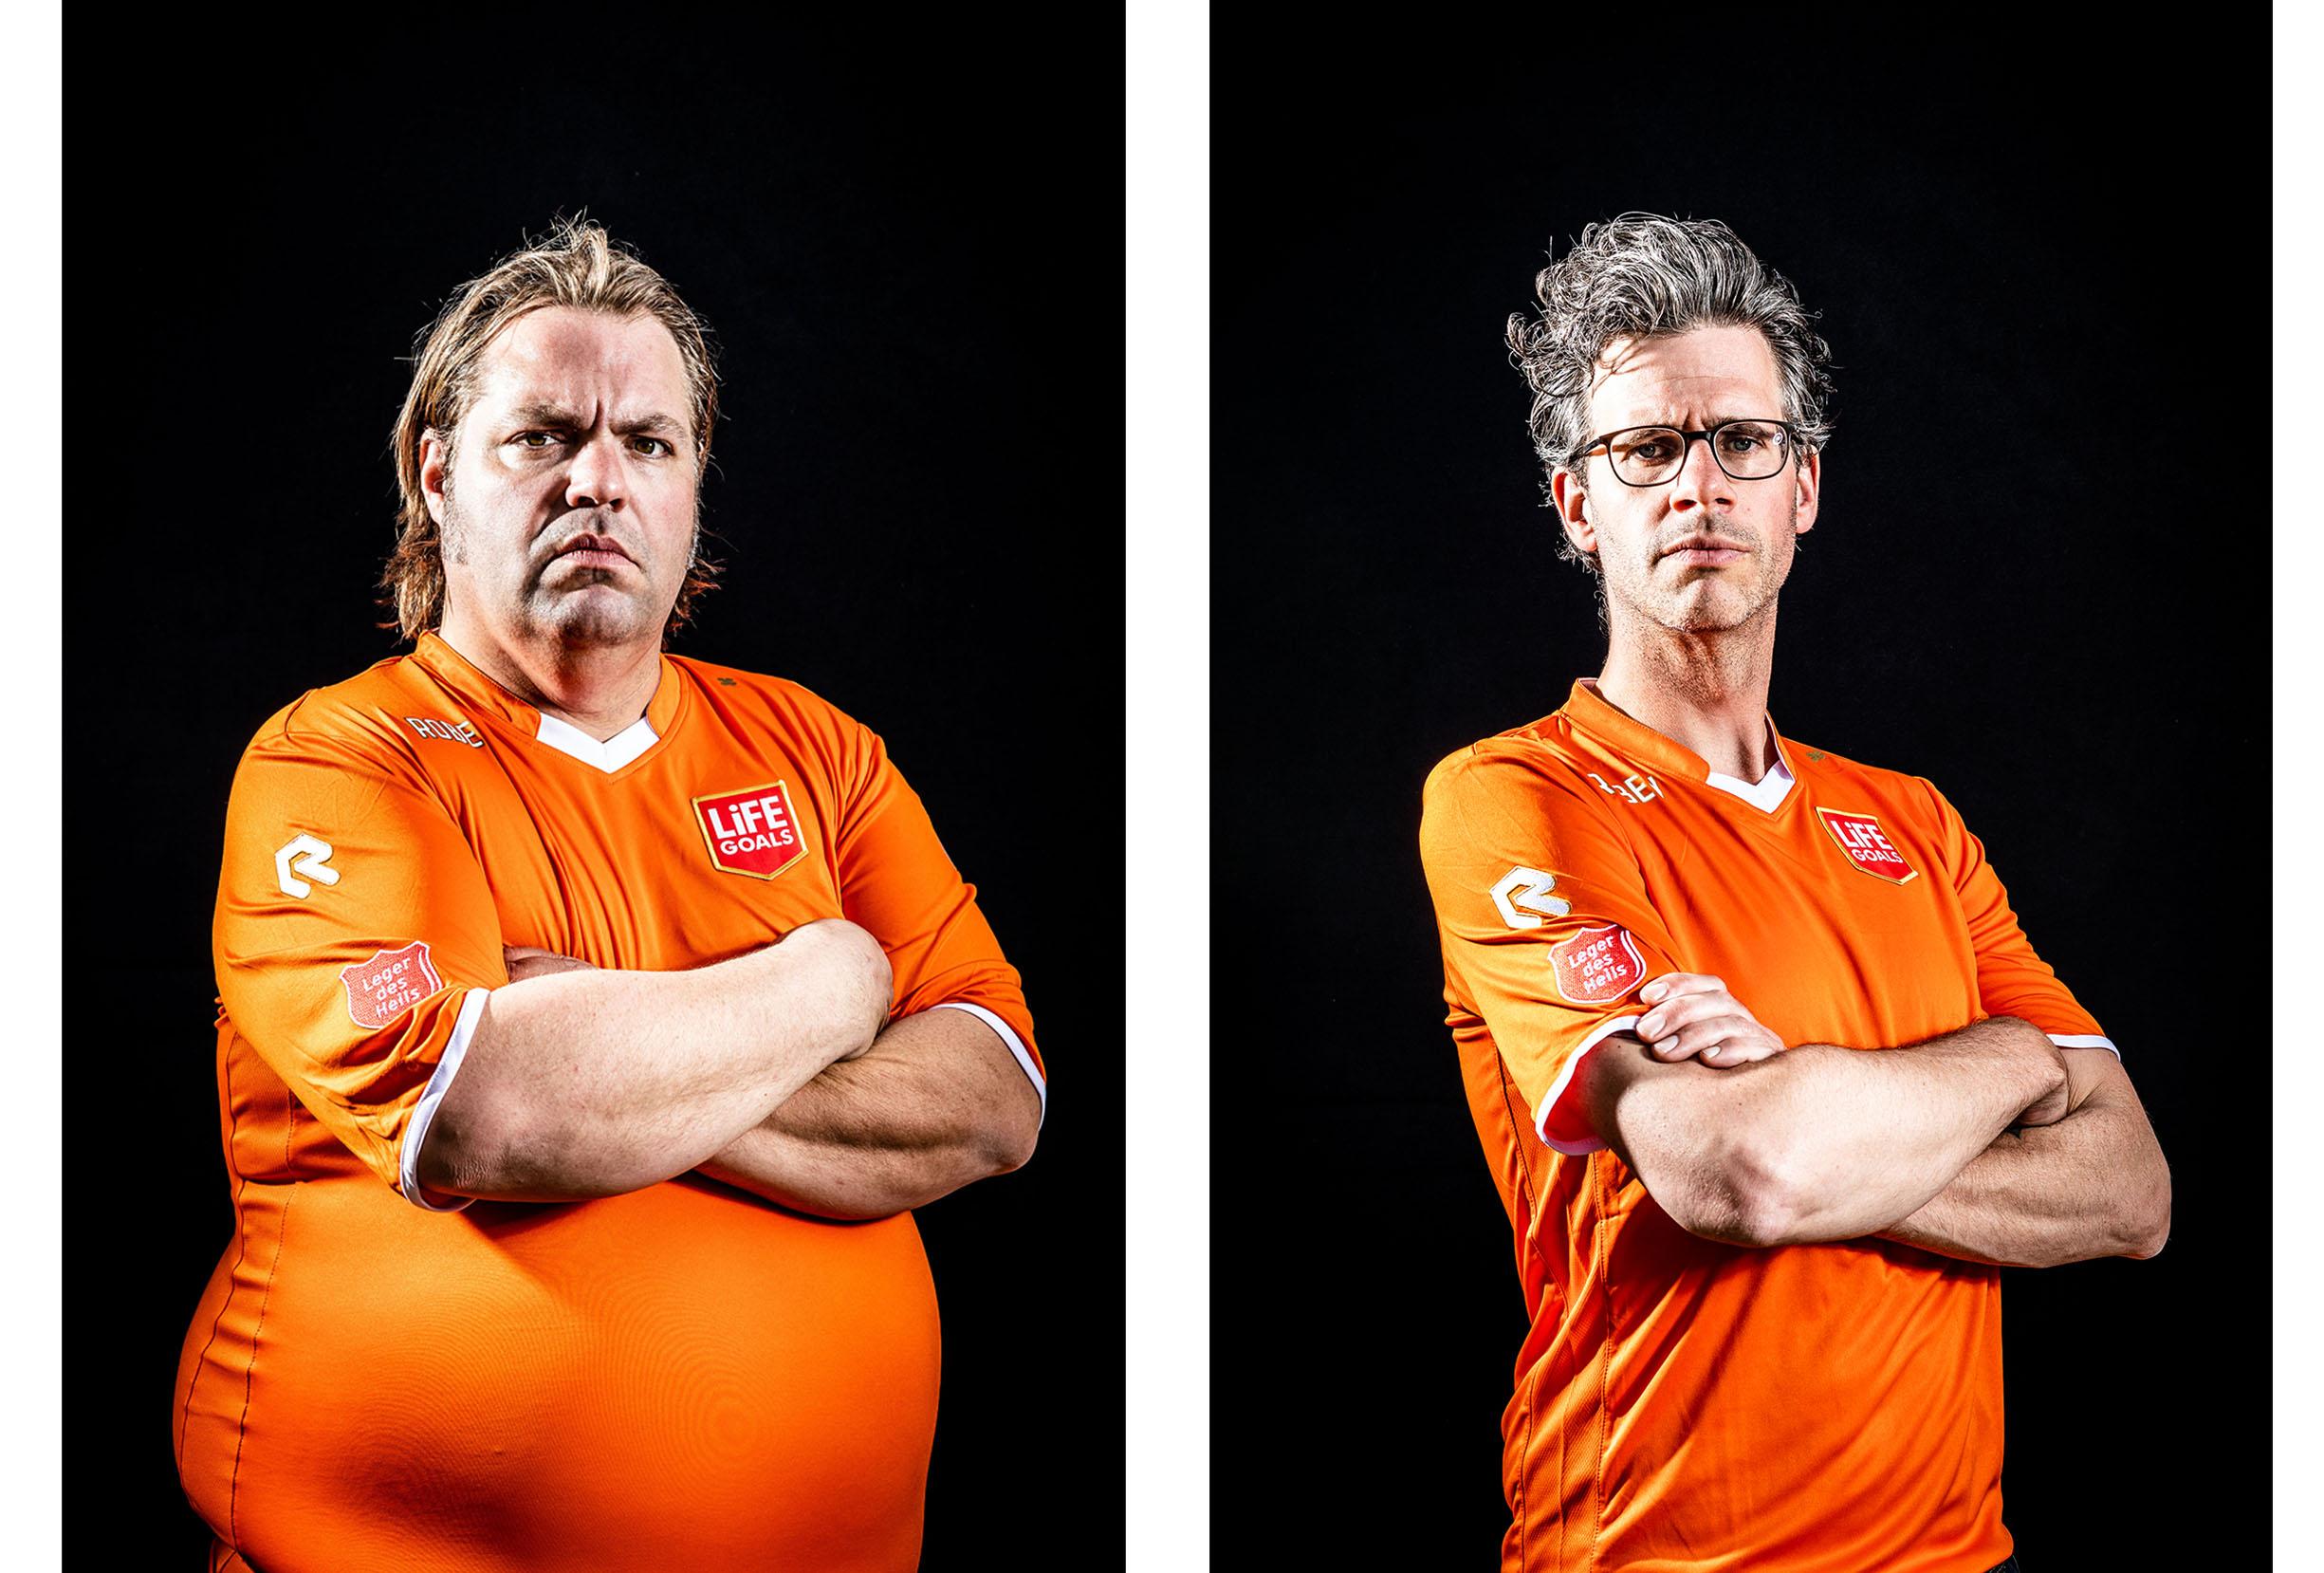 Erik Dijkstra and Frank Evenblijn by Karym Ahmed